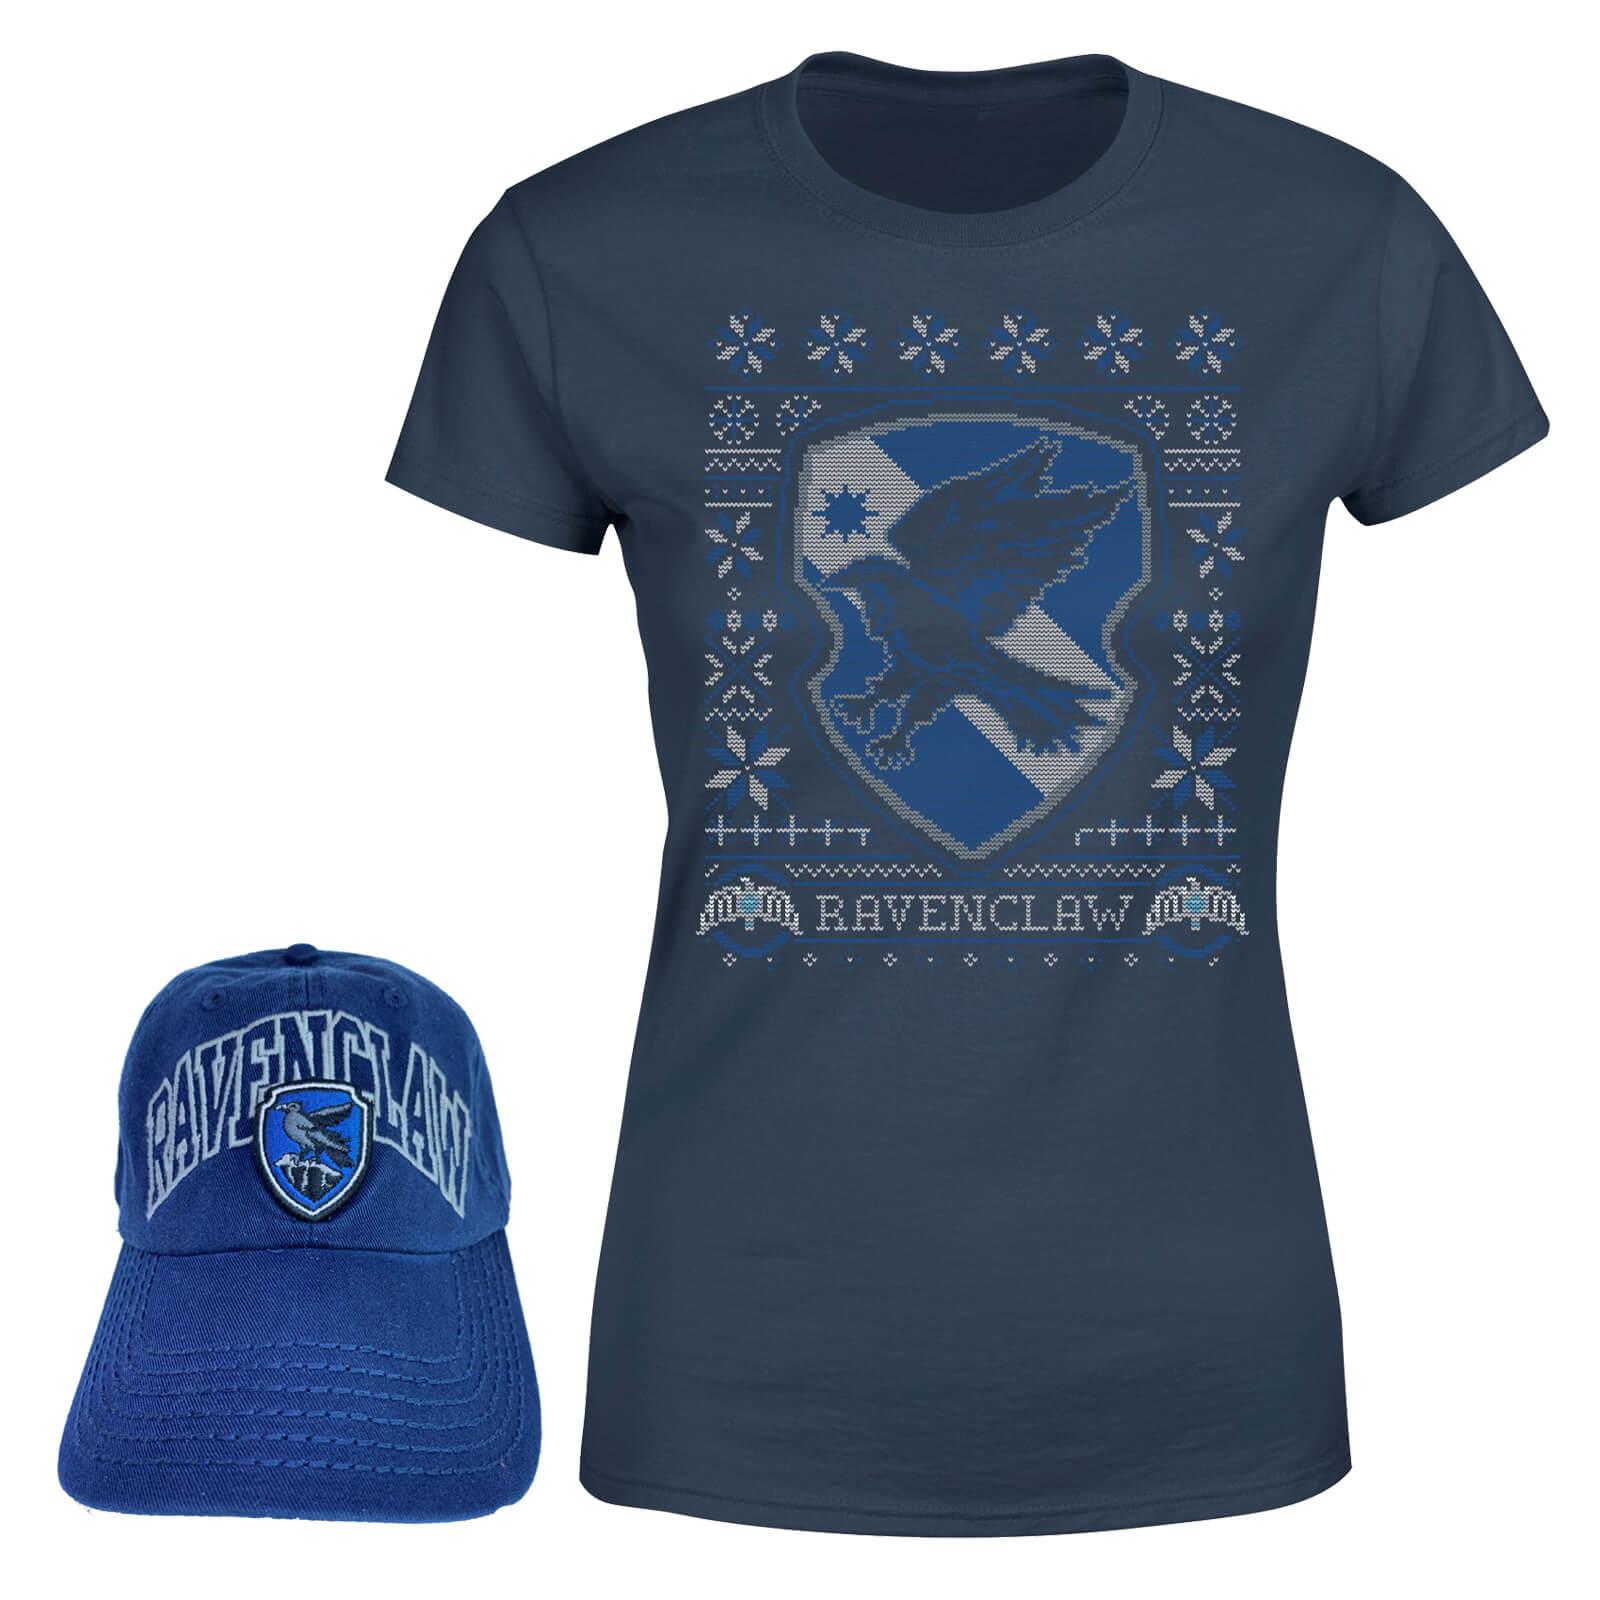 d782da7d2ec Harry Potter Ravenclaw T-Shirt and Cap Bundle - Navy | IWOOT